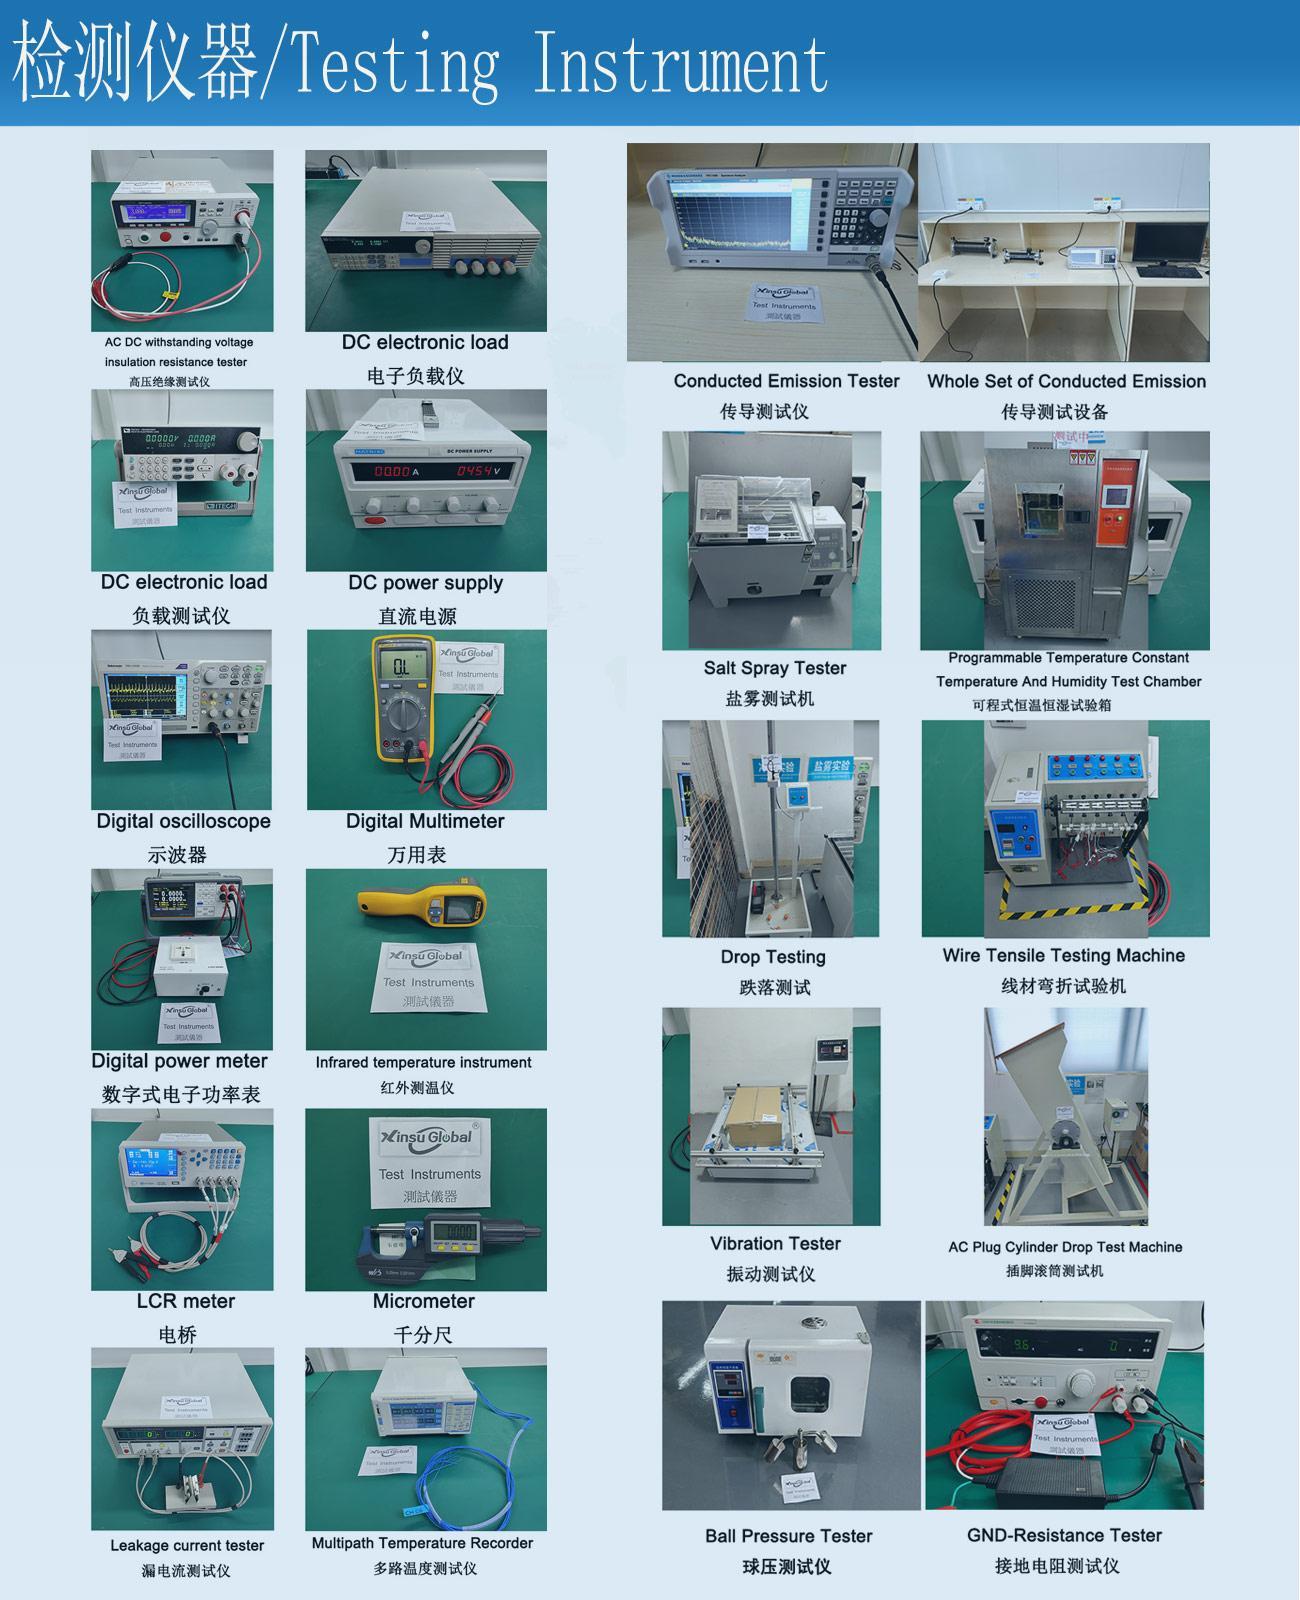 UL GS PSE認証25.2V2A鋰電池充電器 50.4W鋰電池充電器 9